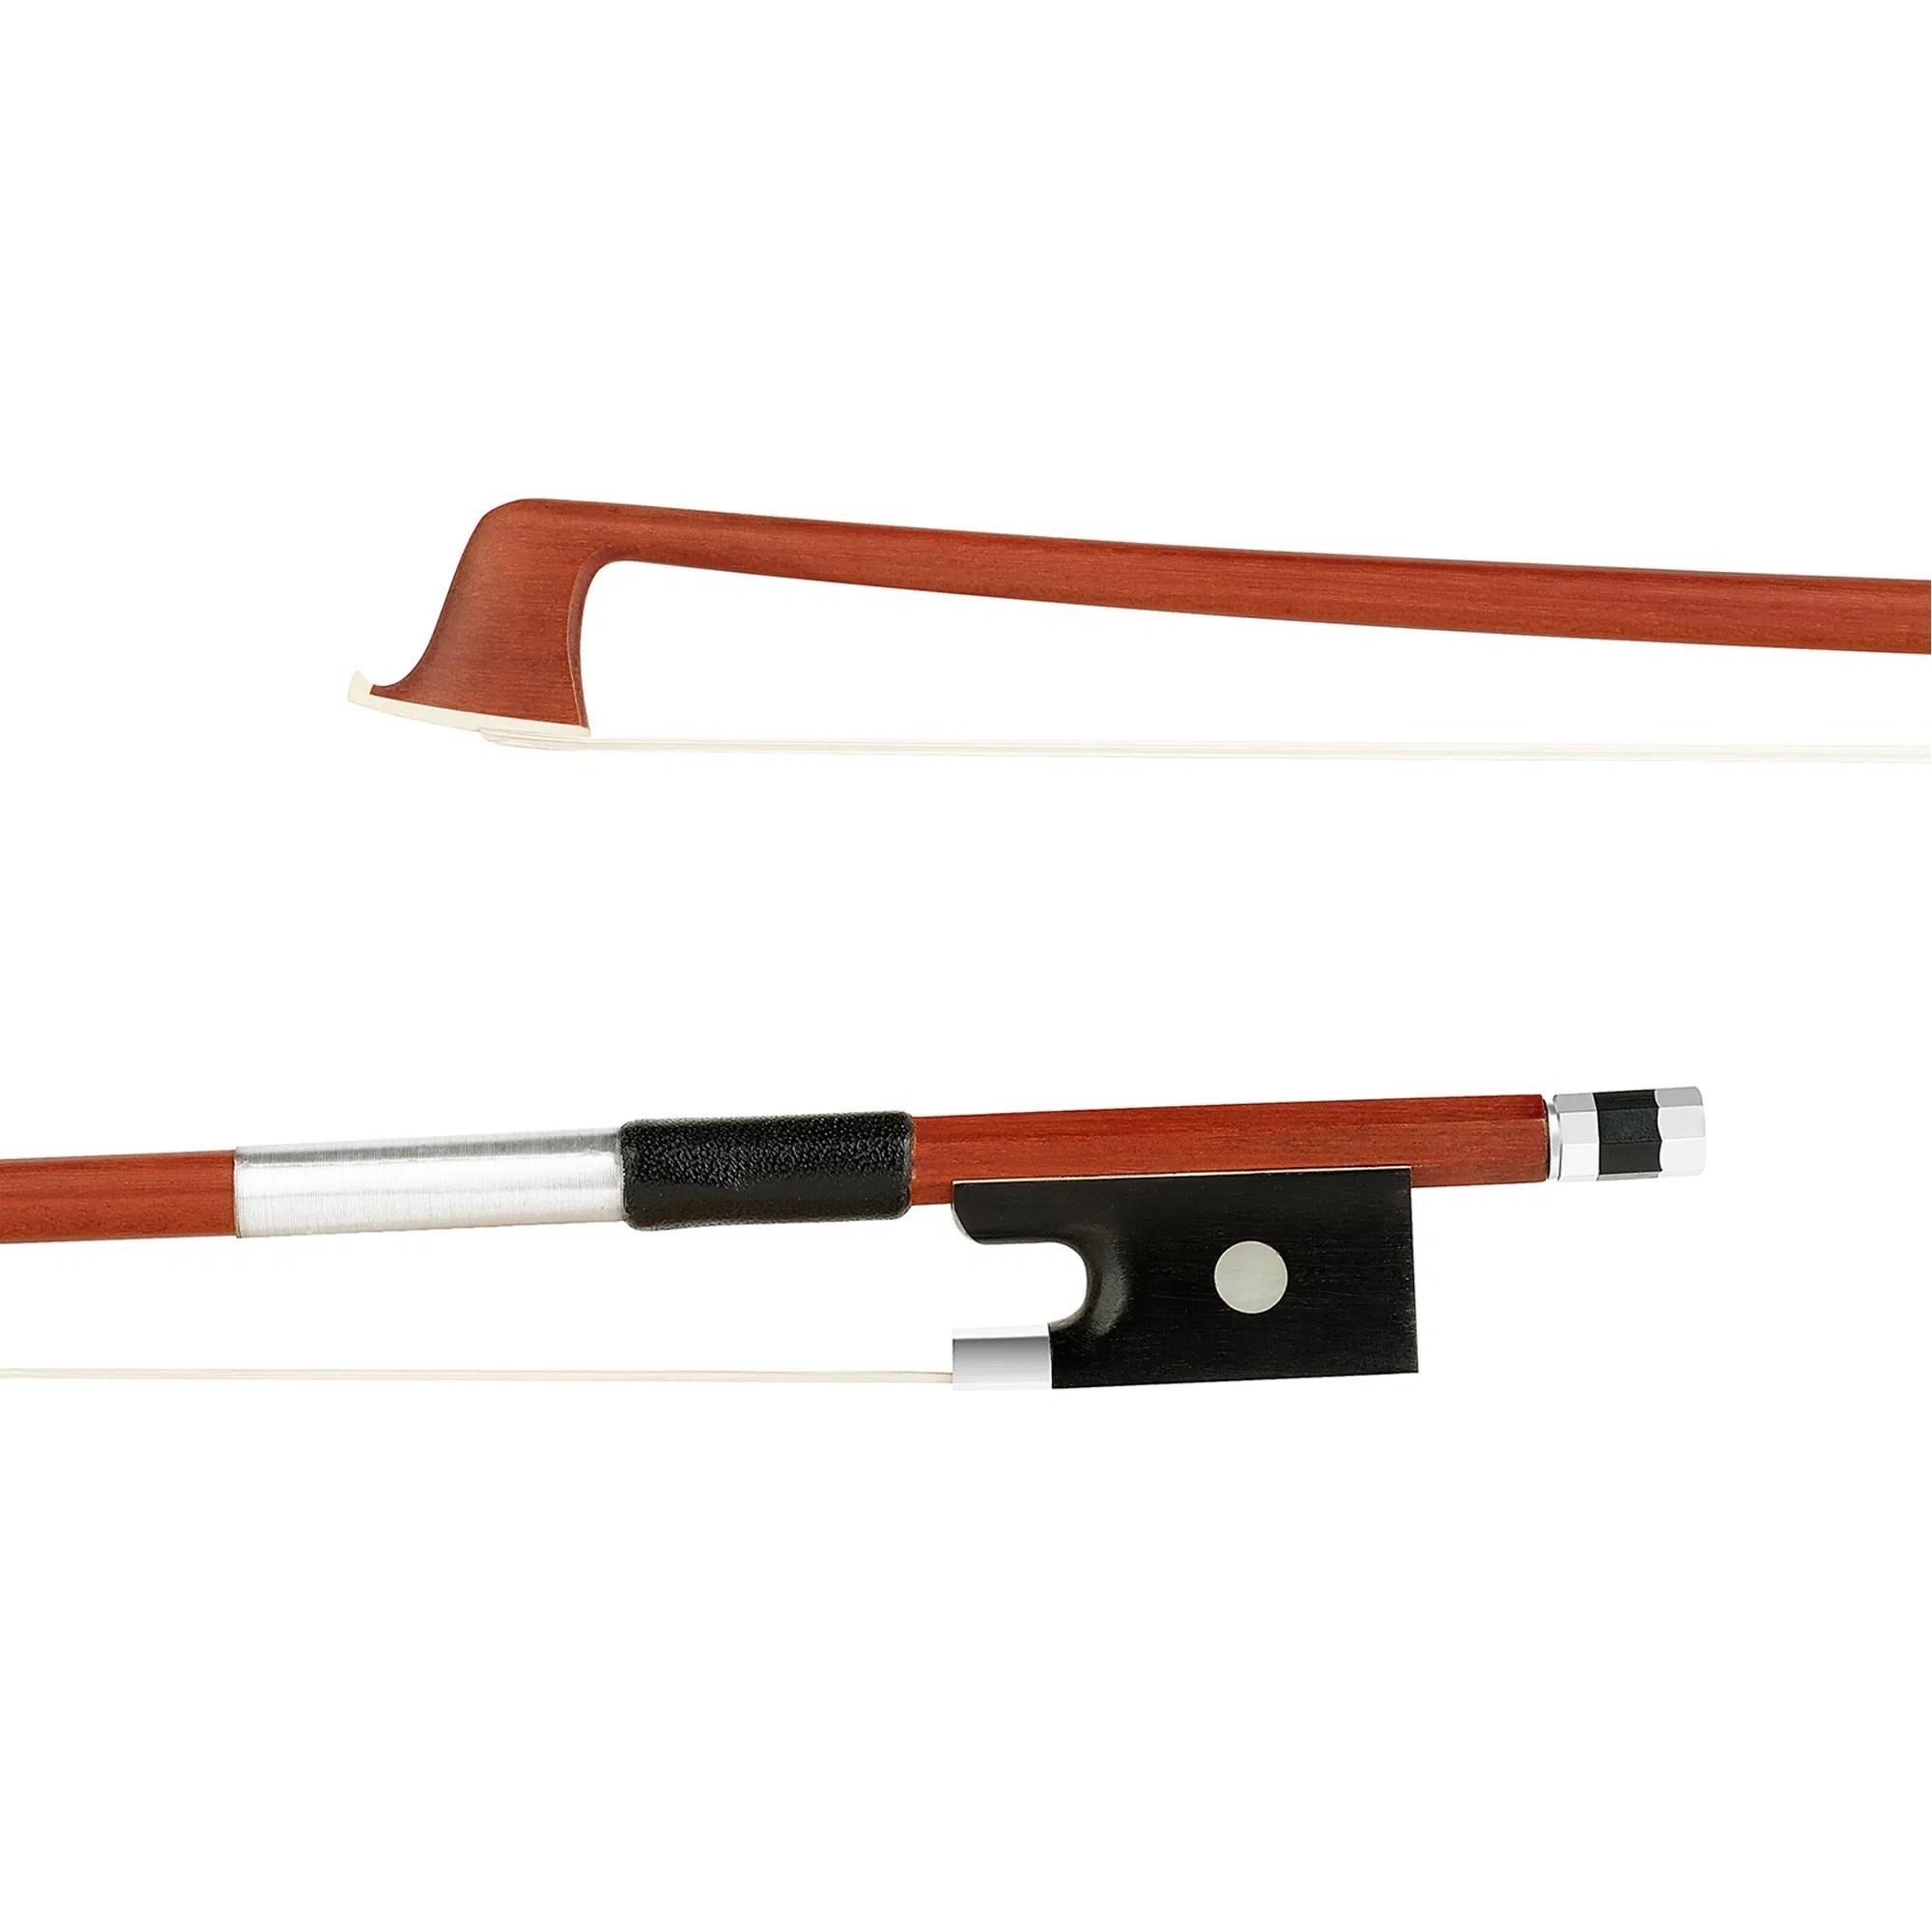 3/4 student Brazilwood violin bow, half-lined, unbranded